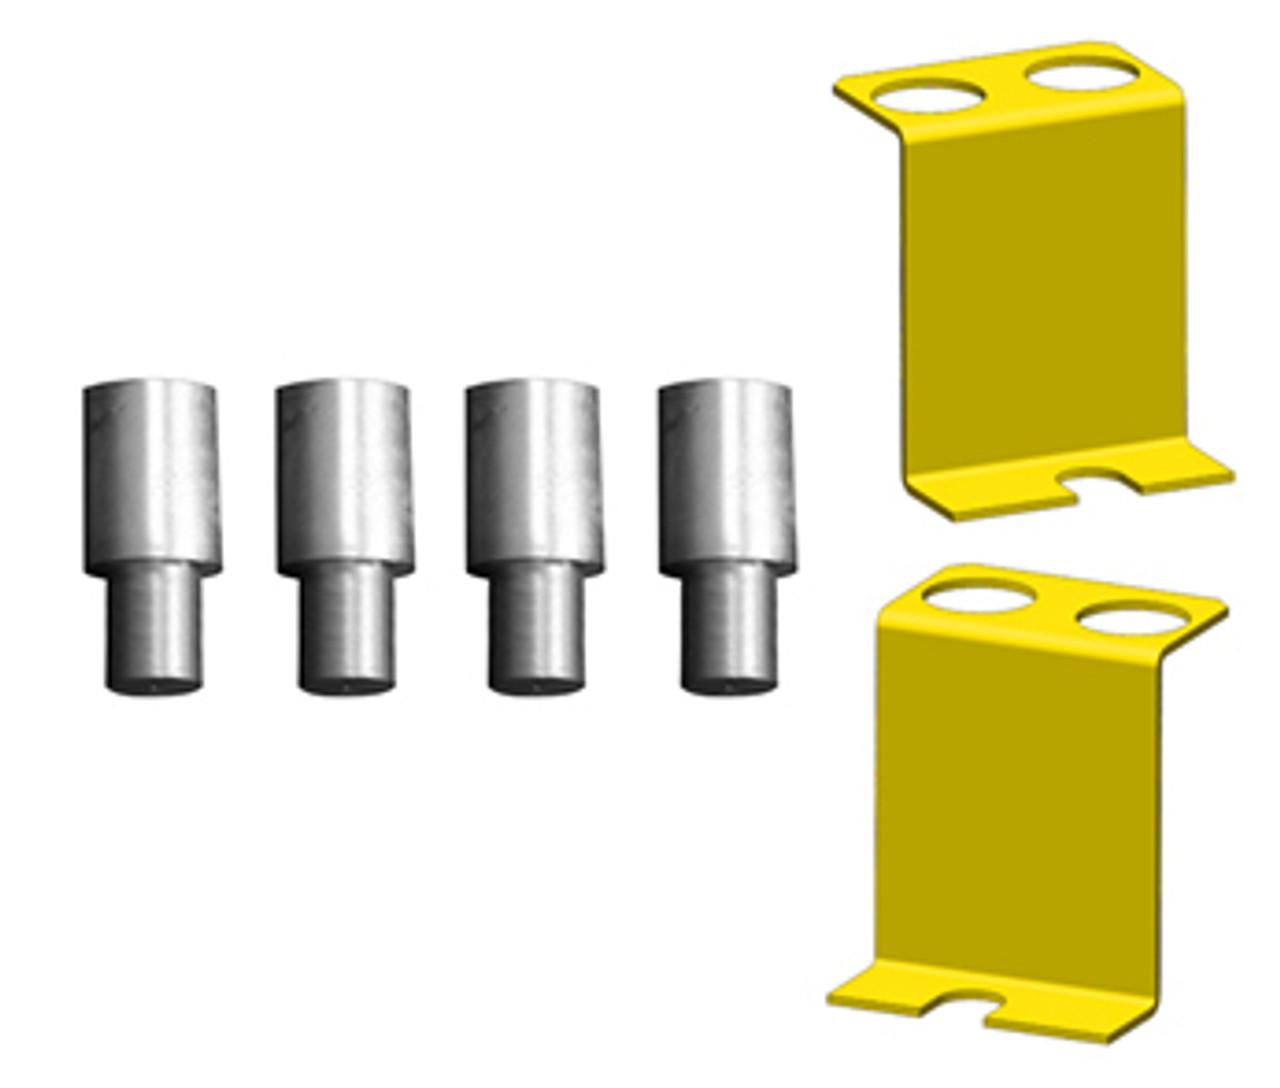 BENDPAK XPR-10-LP Low-Pro Arms, Dual-Width, 10,000 Lb. Capacity, Two-Post